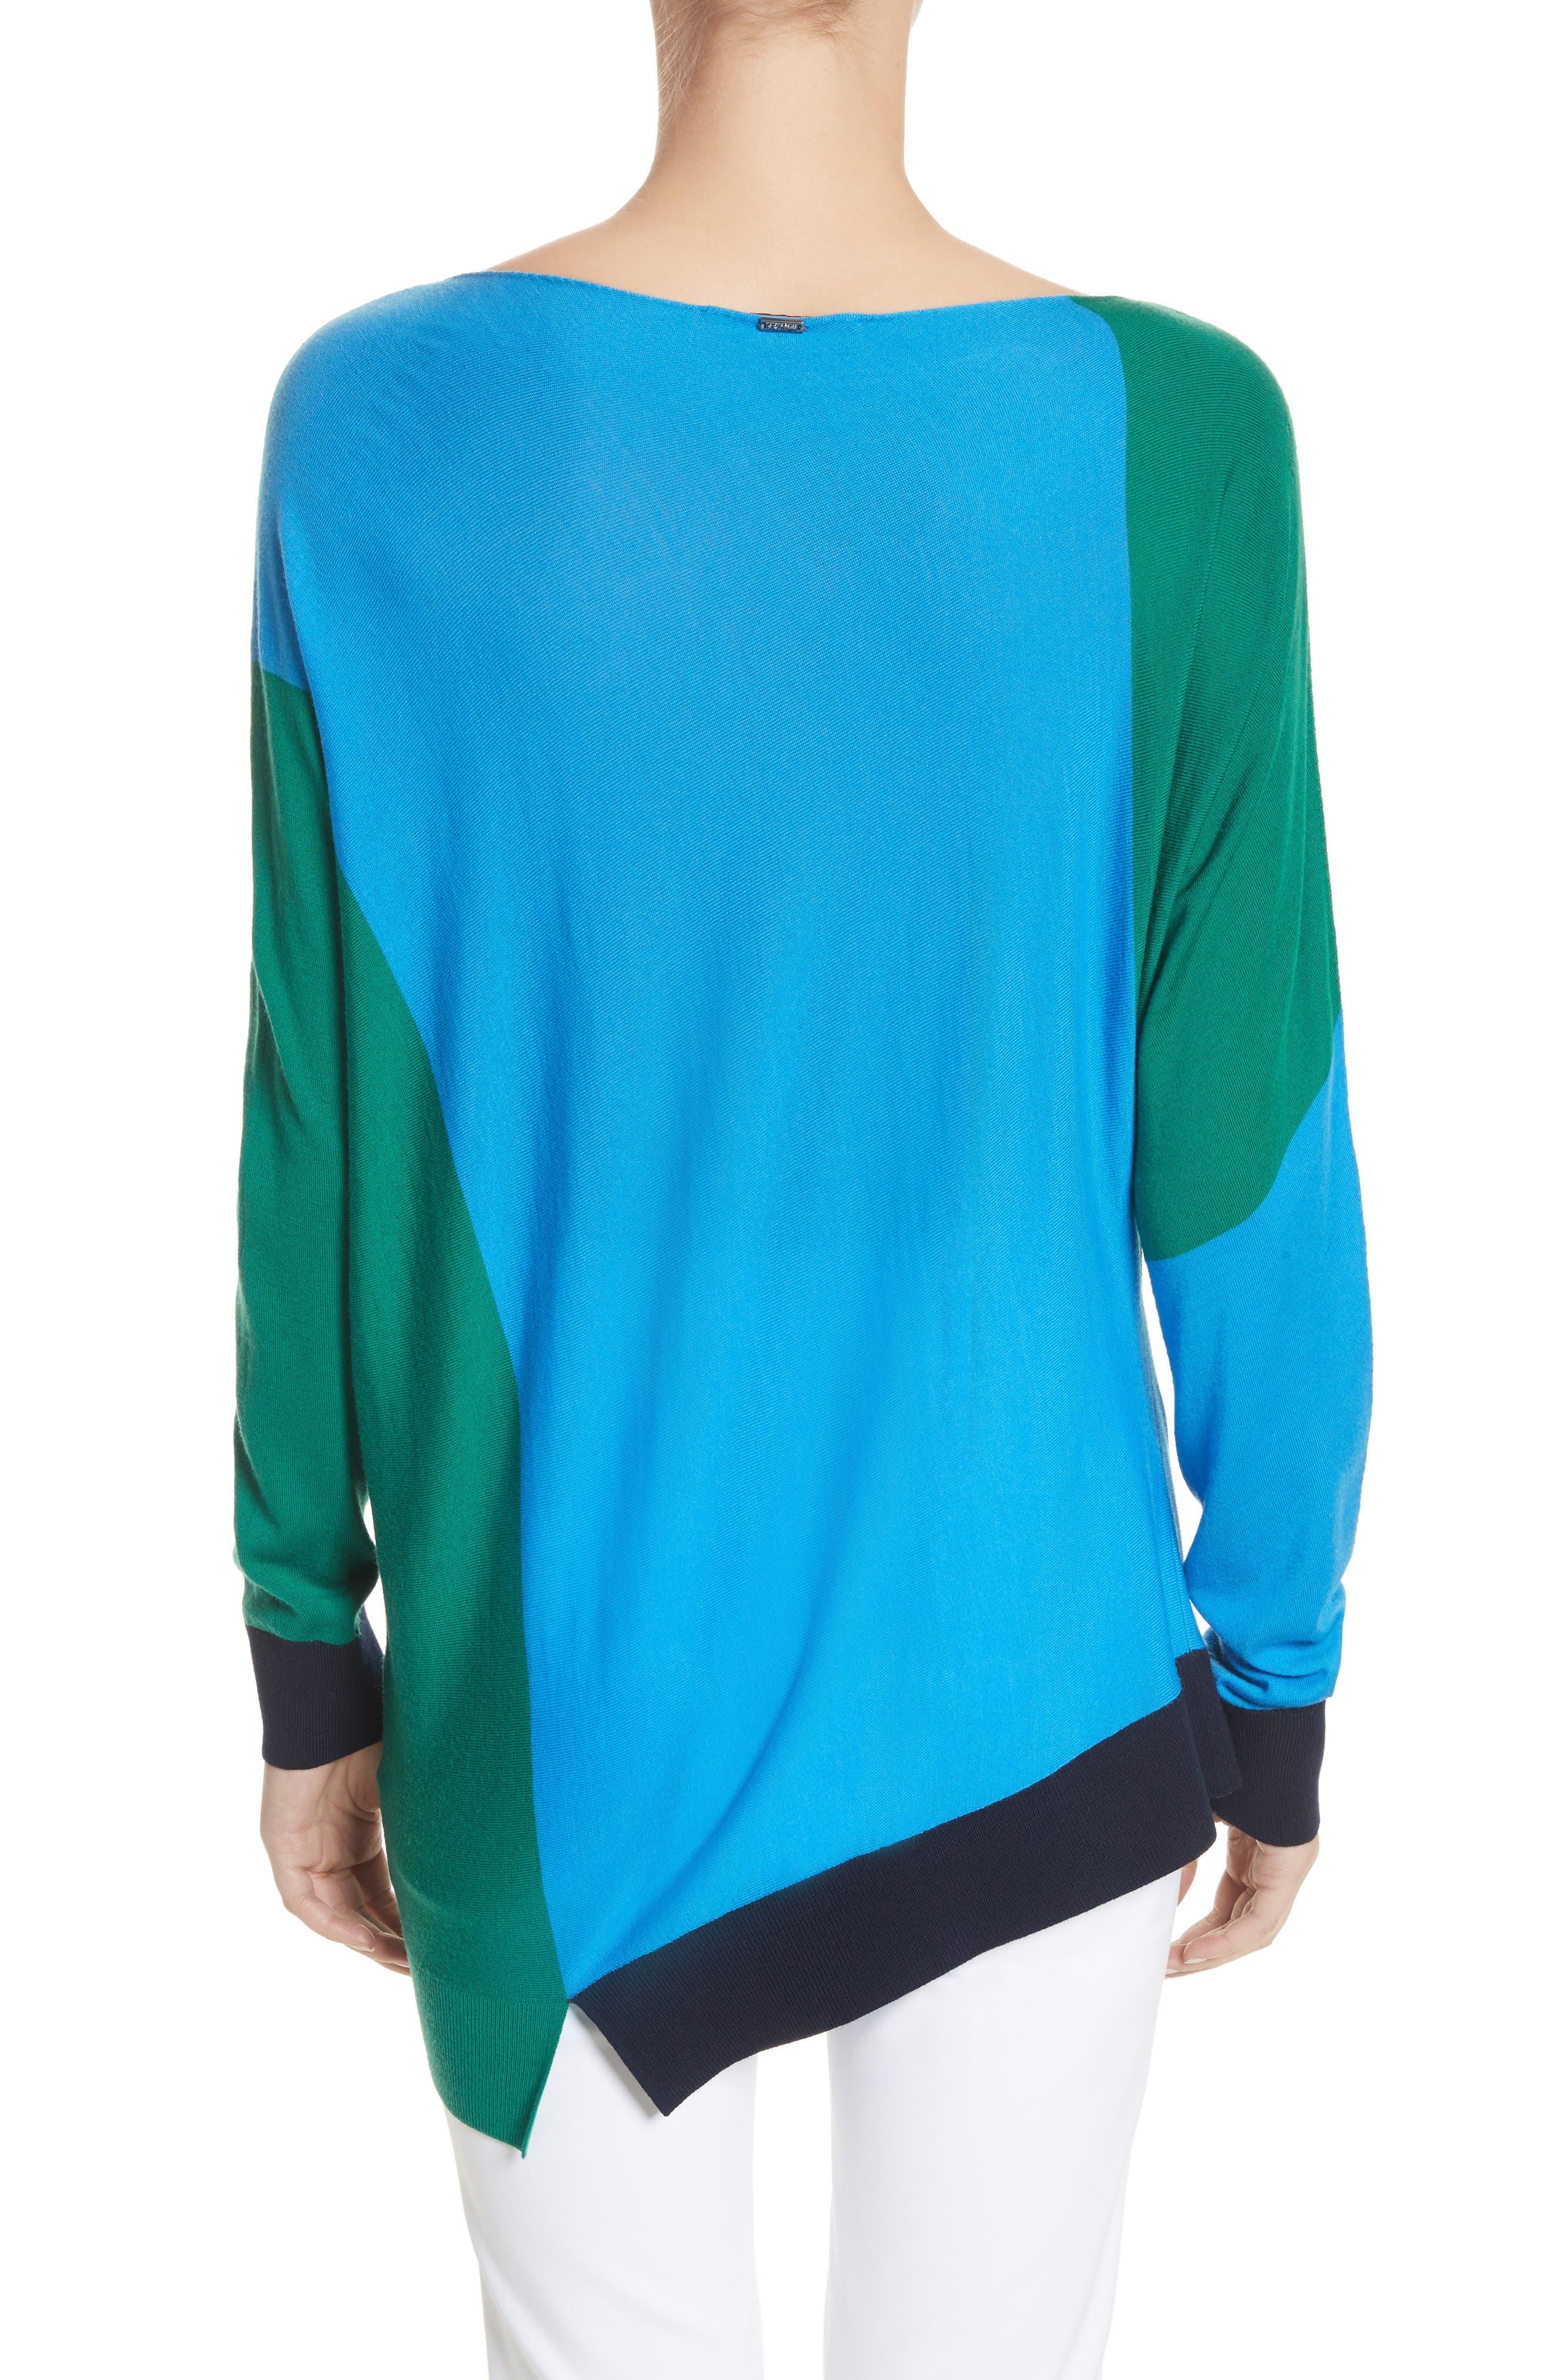 Colorblock Knit Wool Sweater,                             Alternate thumbnail 2, color,                             Cyan/ Emerald/ Navy